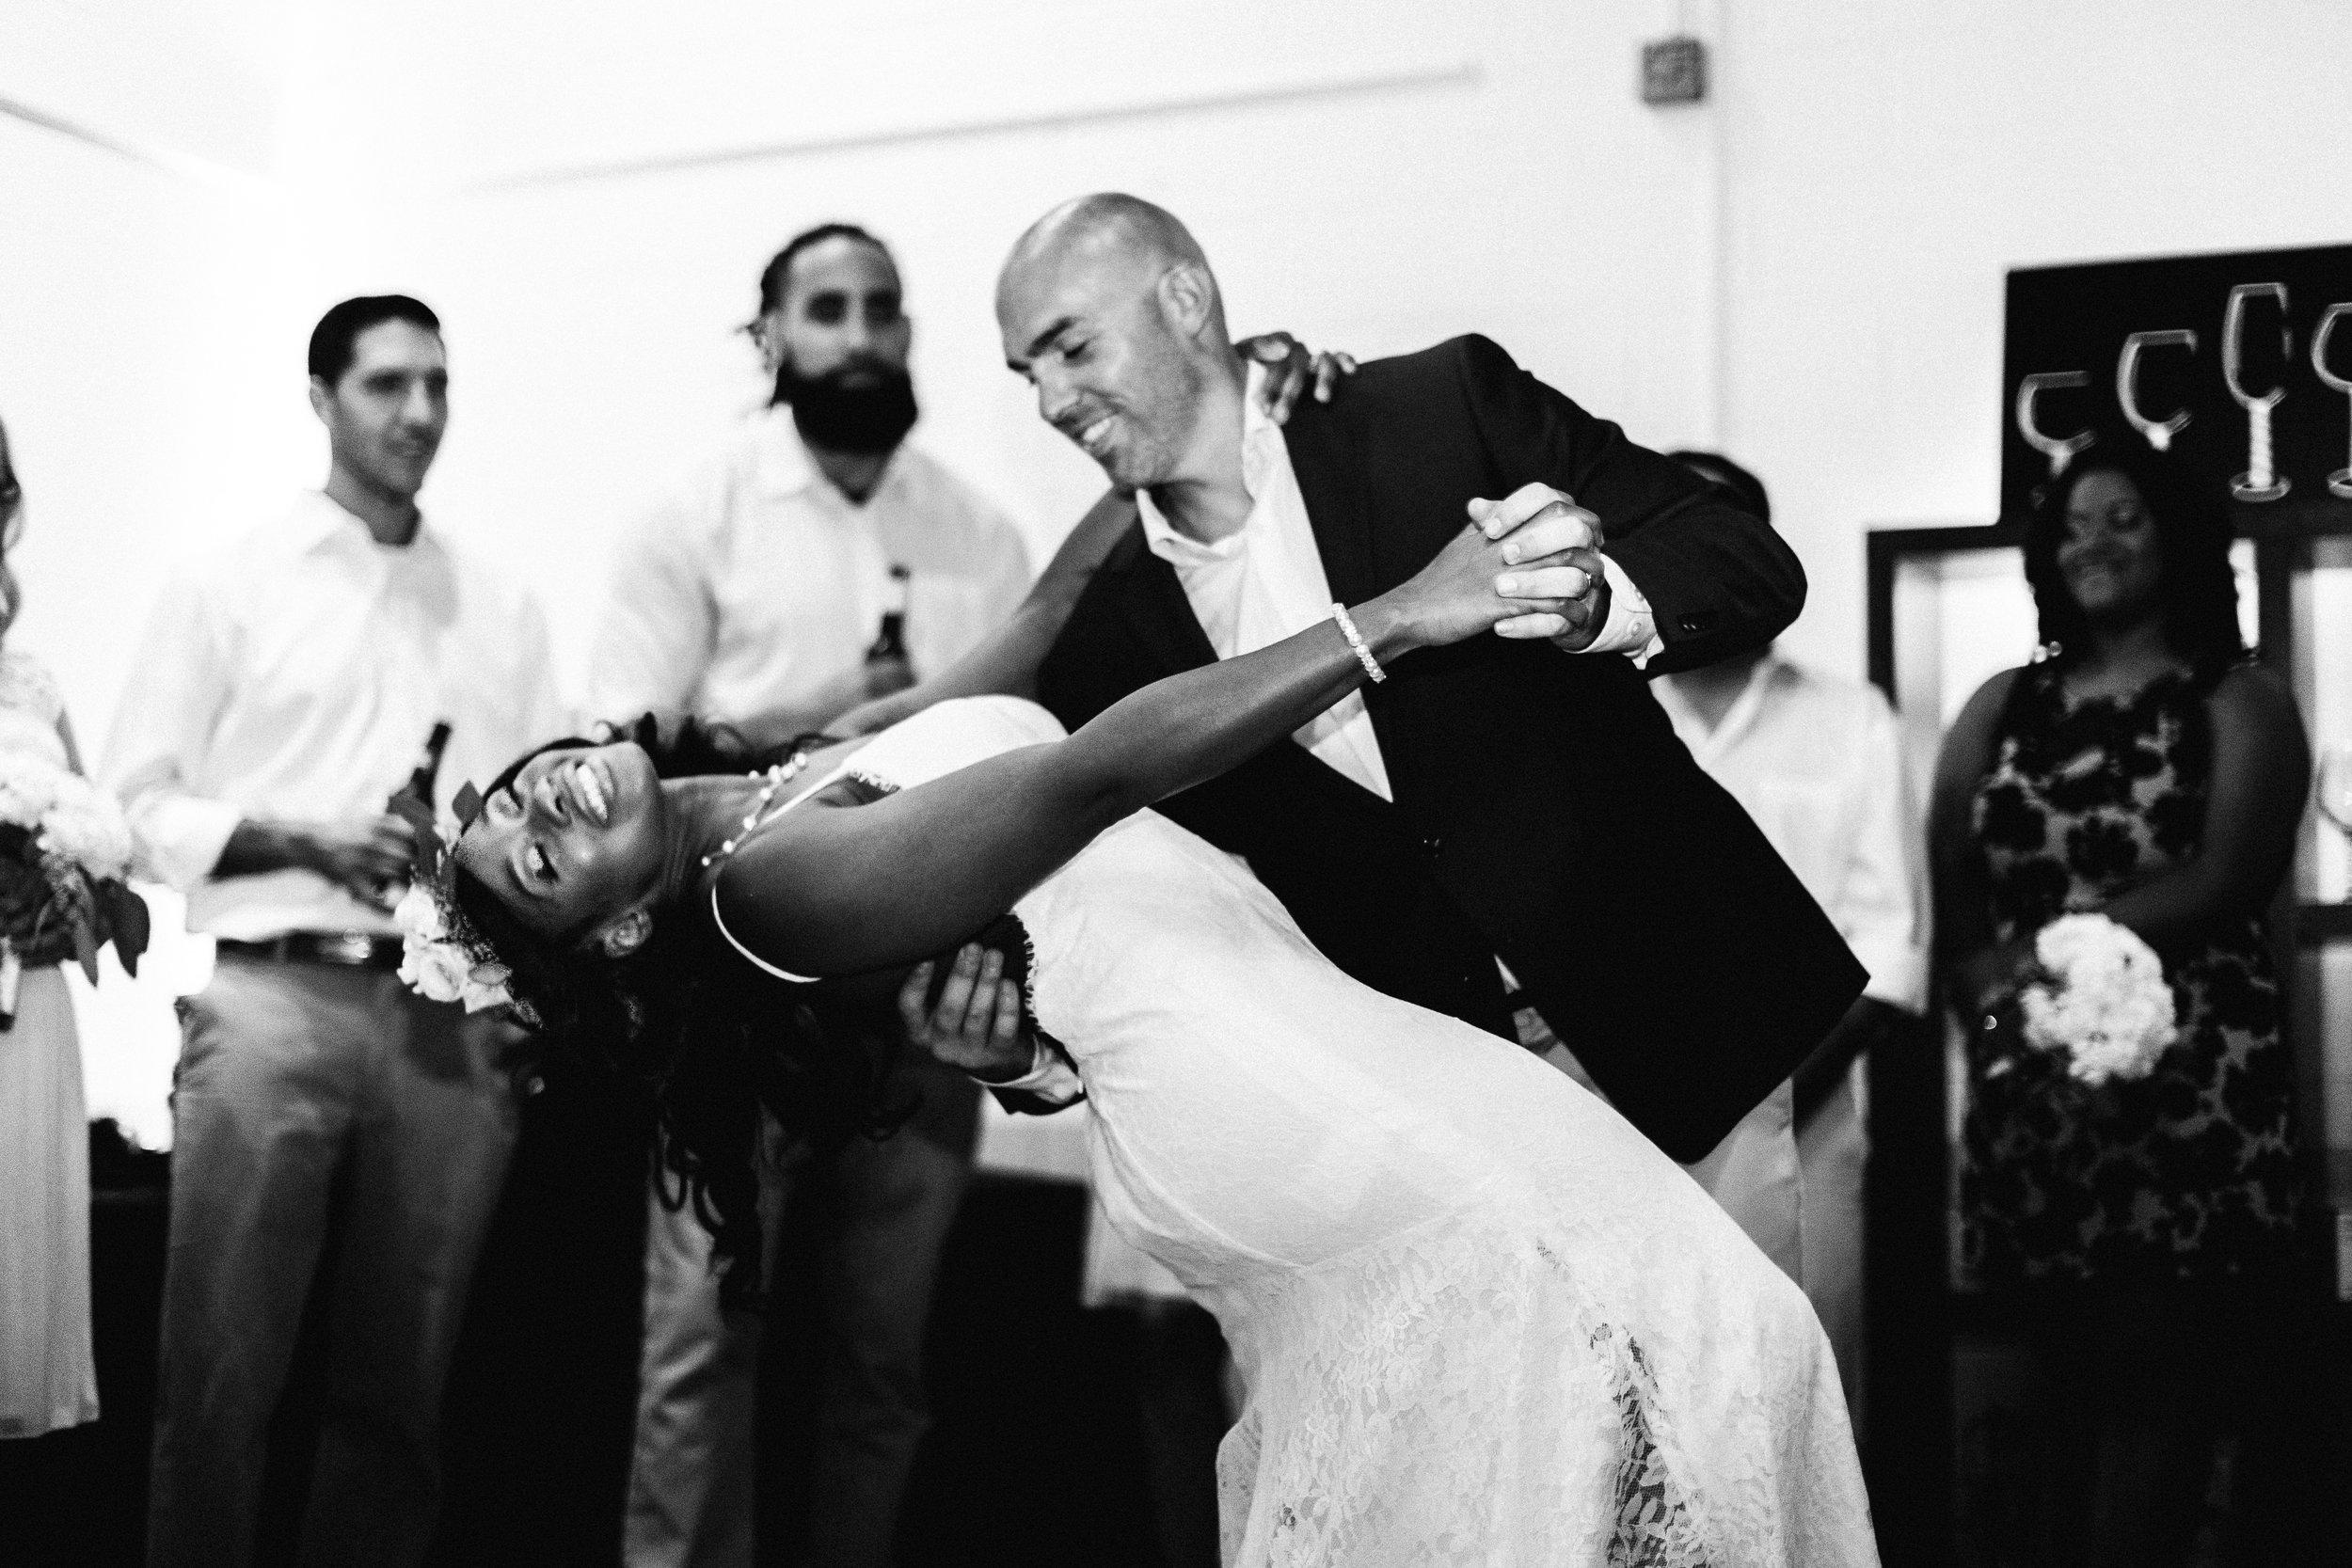 2017.09.16 Ashley and Chuck O'Day Quantam Leap Winery Wedding (321 of 462).jpg